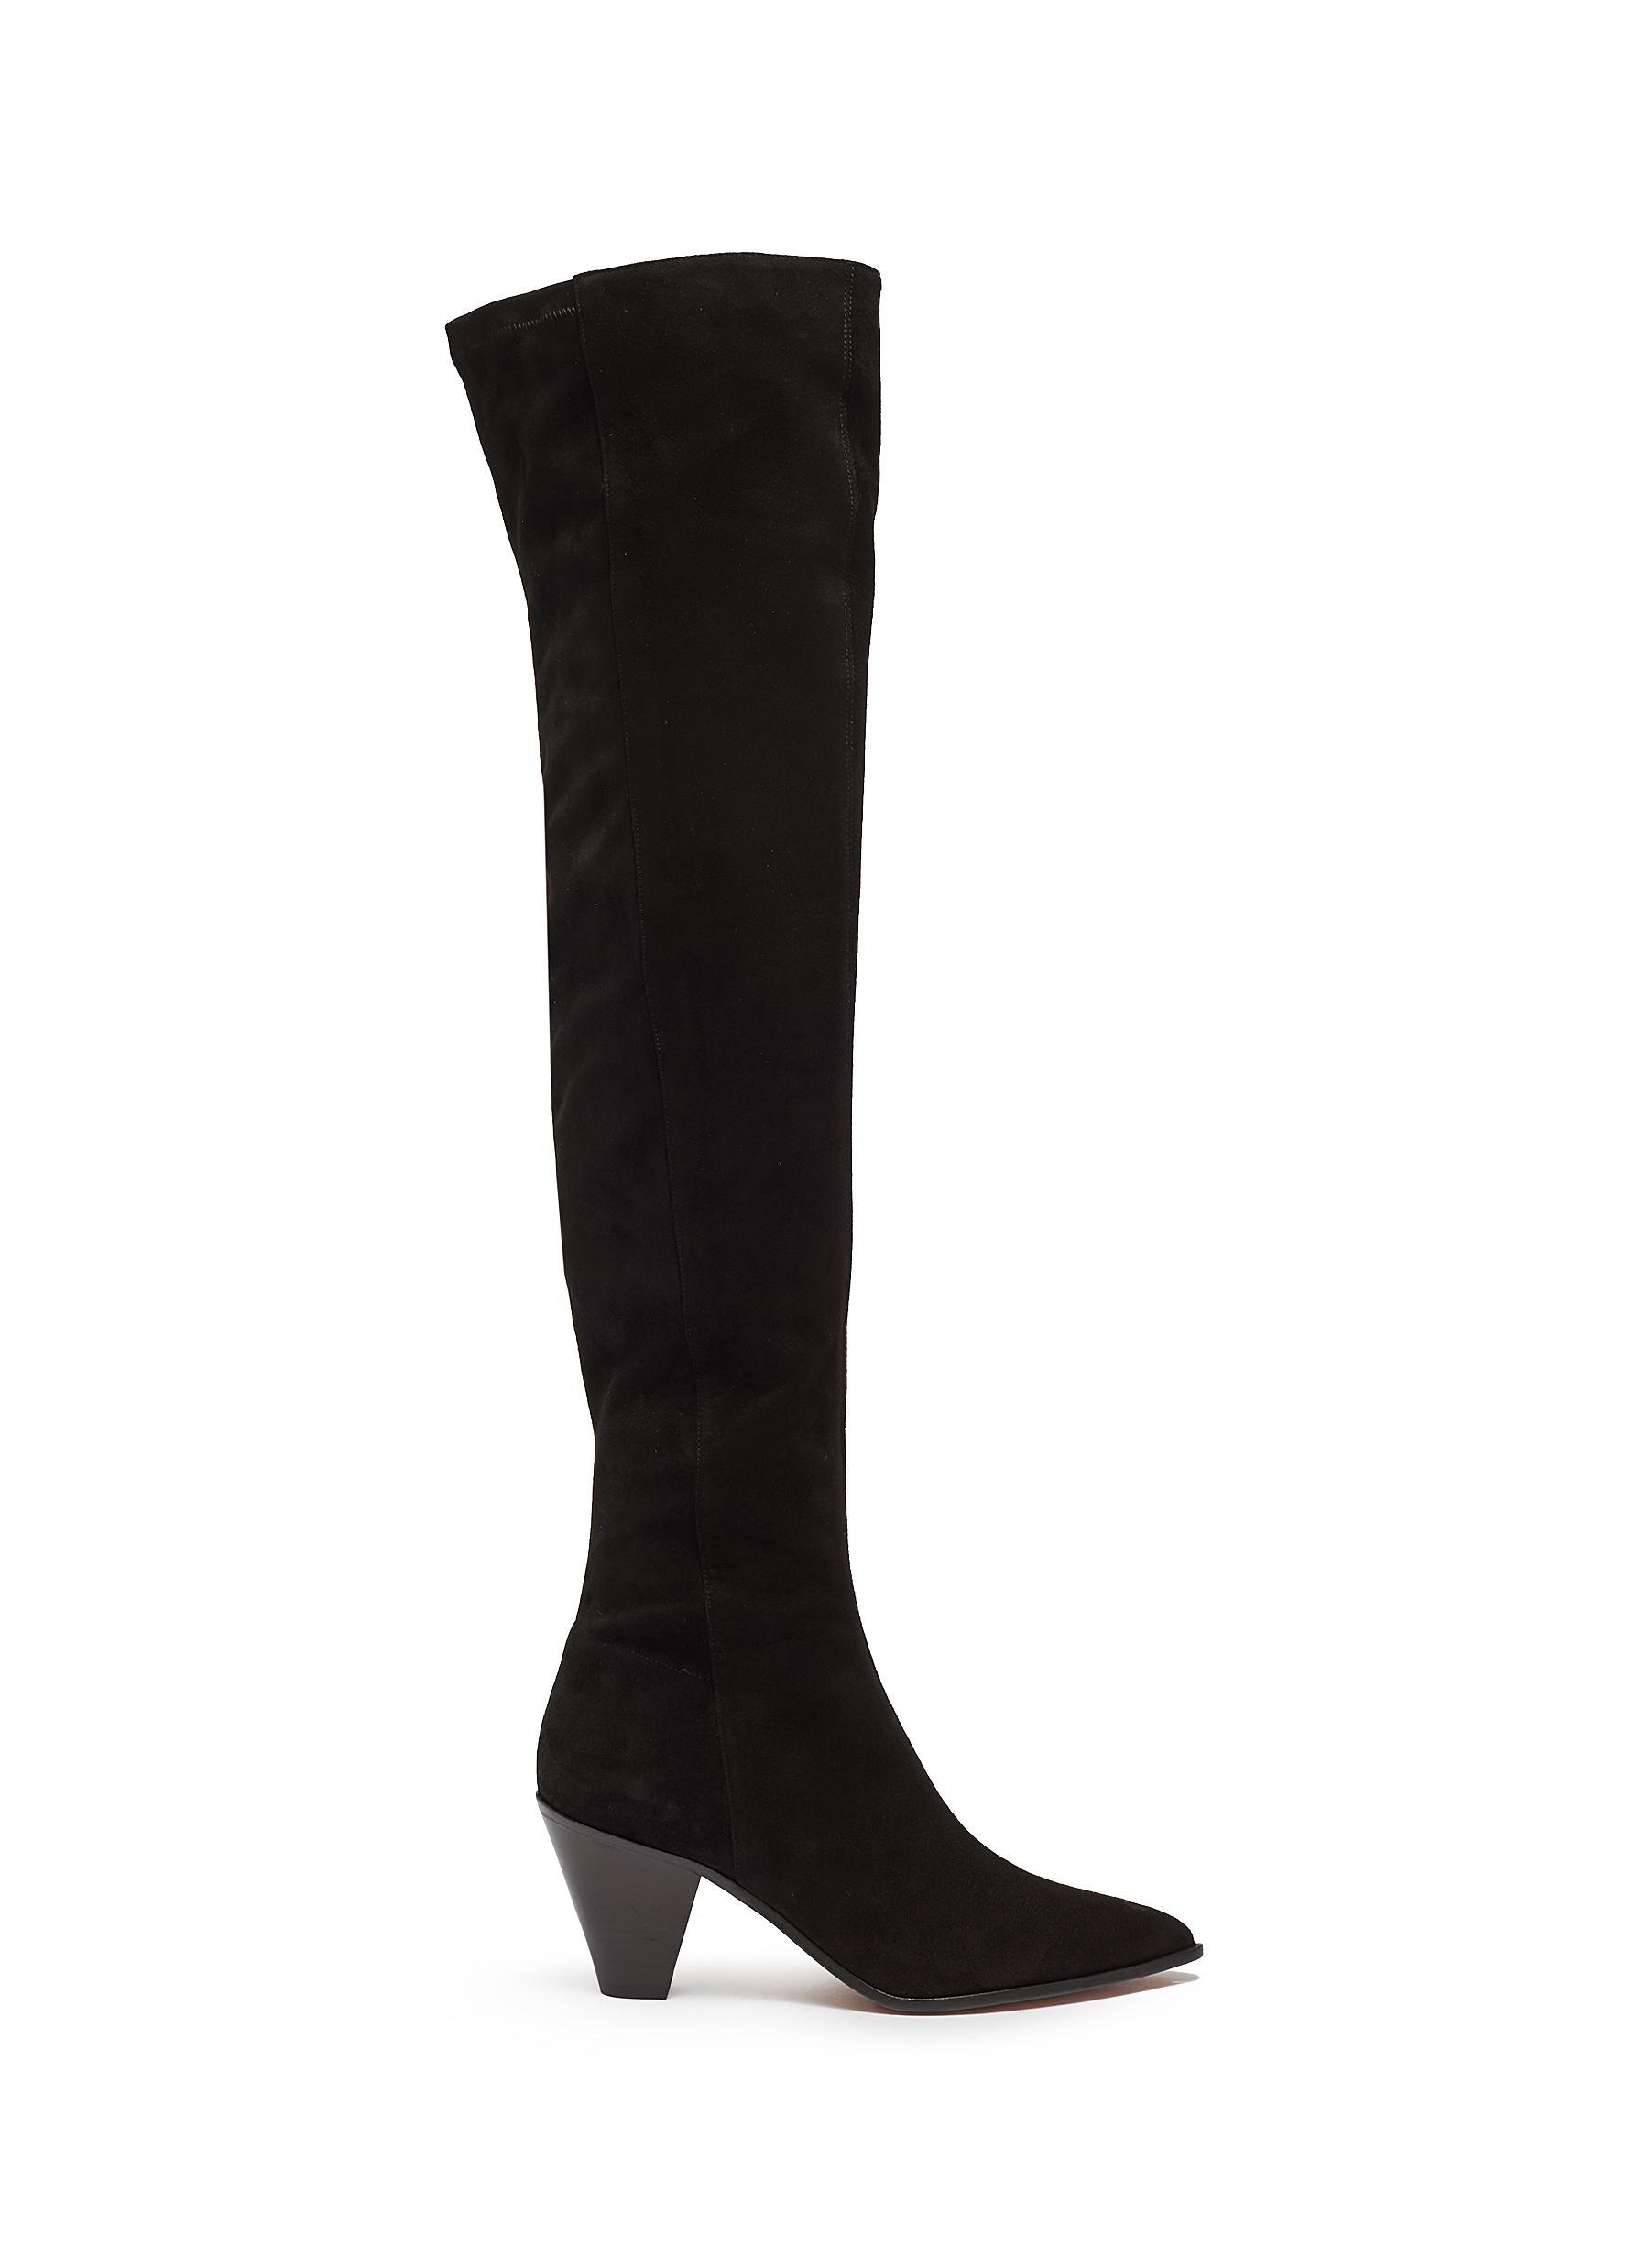 Shoreditch suede knee high boots by Aquazzura